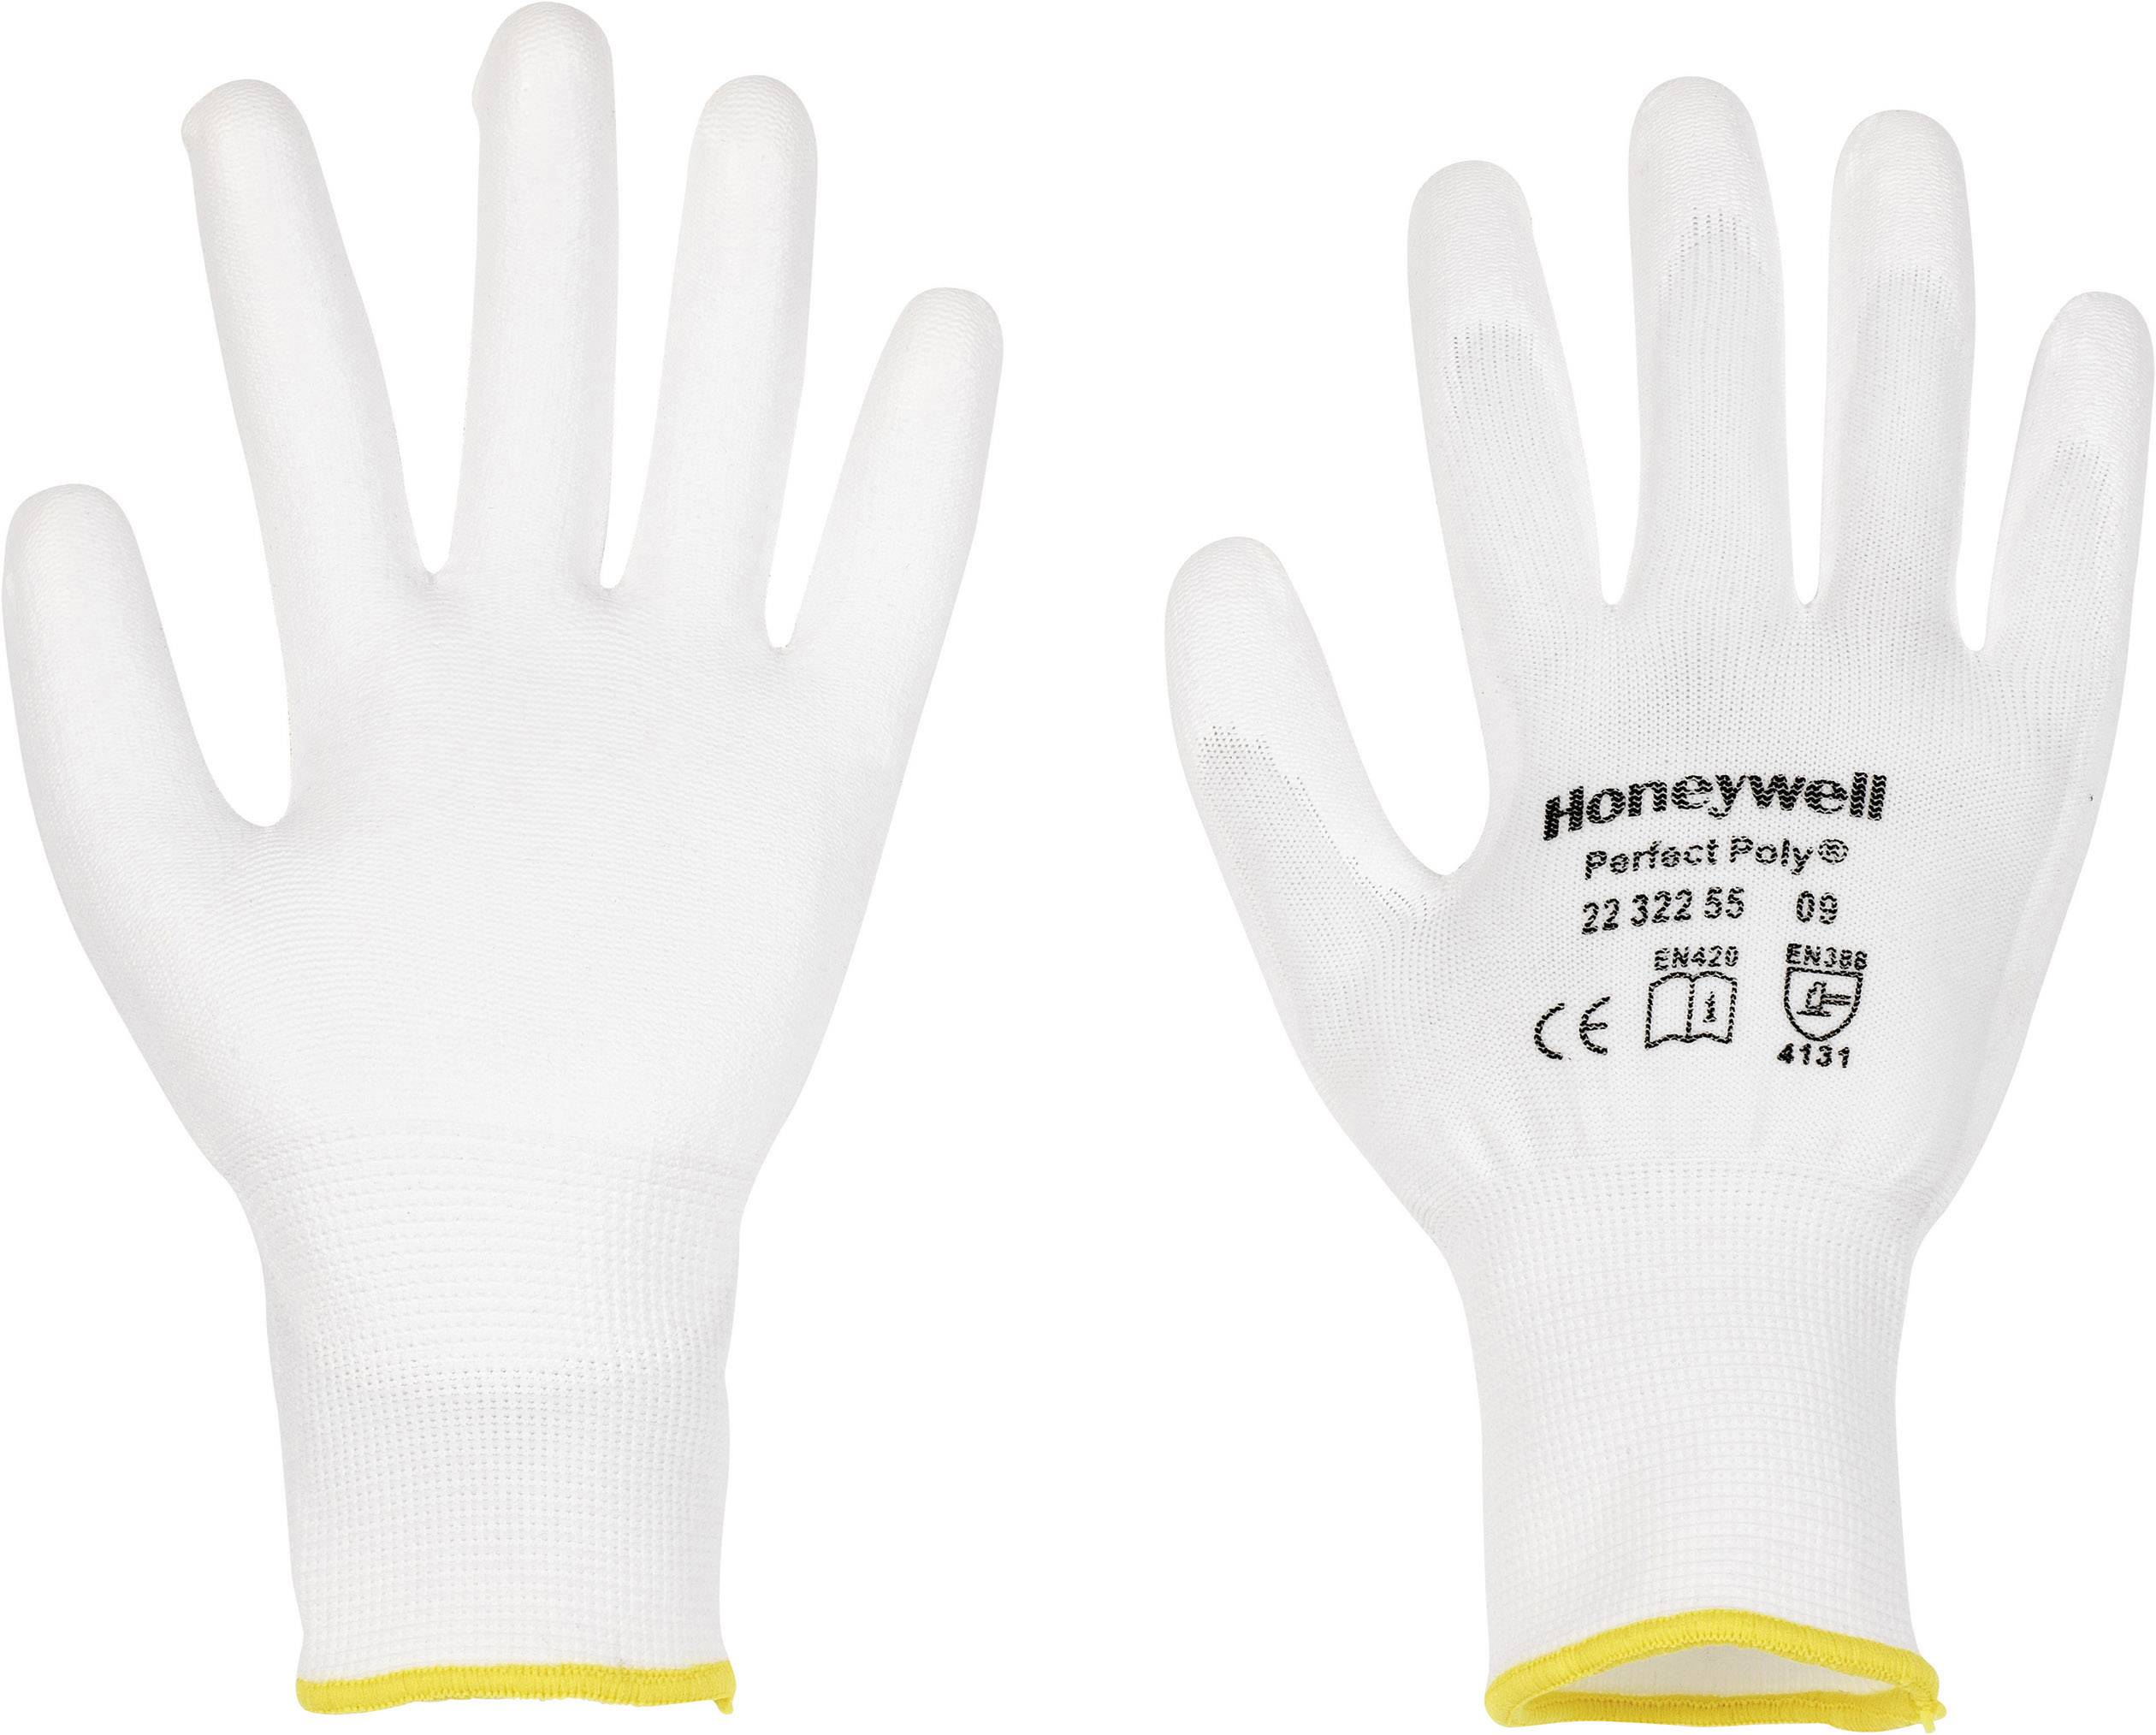 Pracovné rukavice Perfect Fit GANTS BLANCS PERFECTPOLY 2232255, velikost rukavic: 10, XL